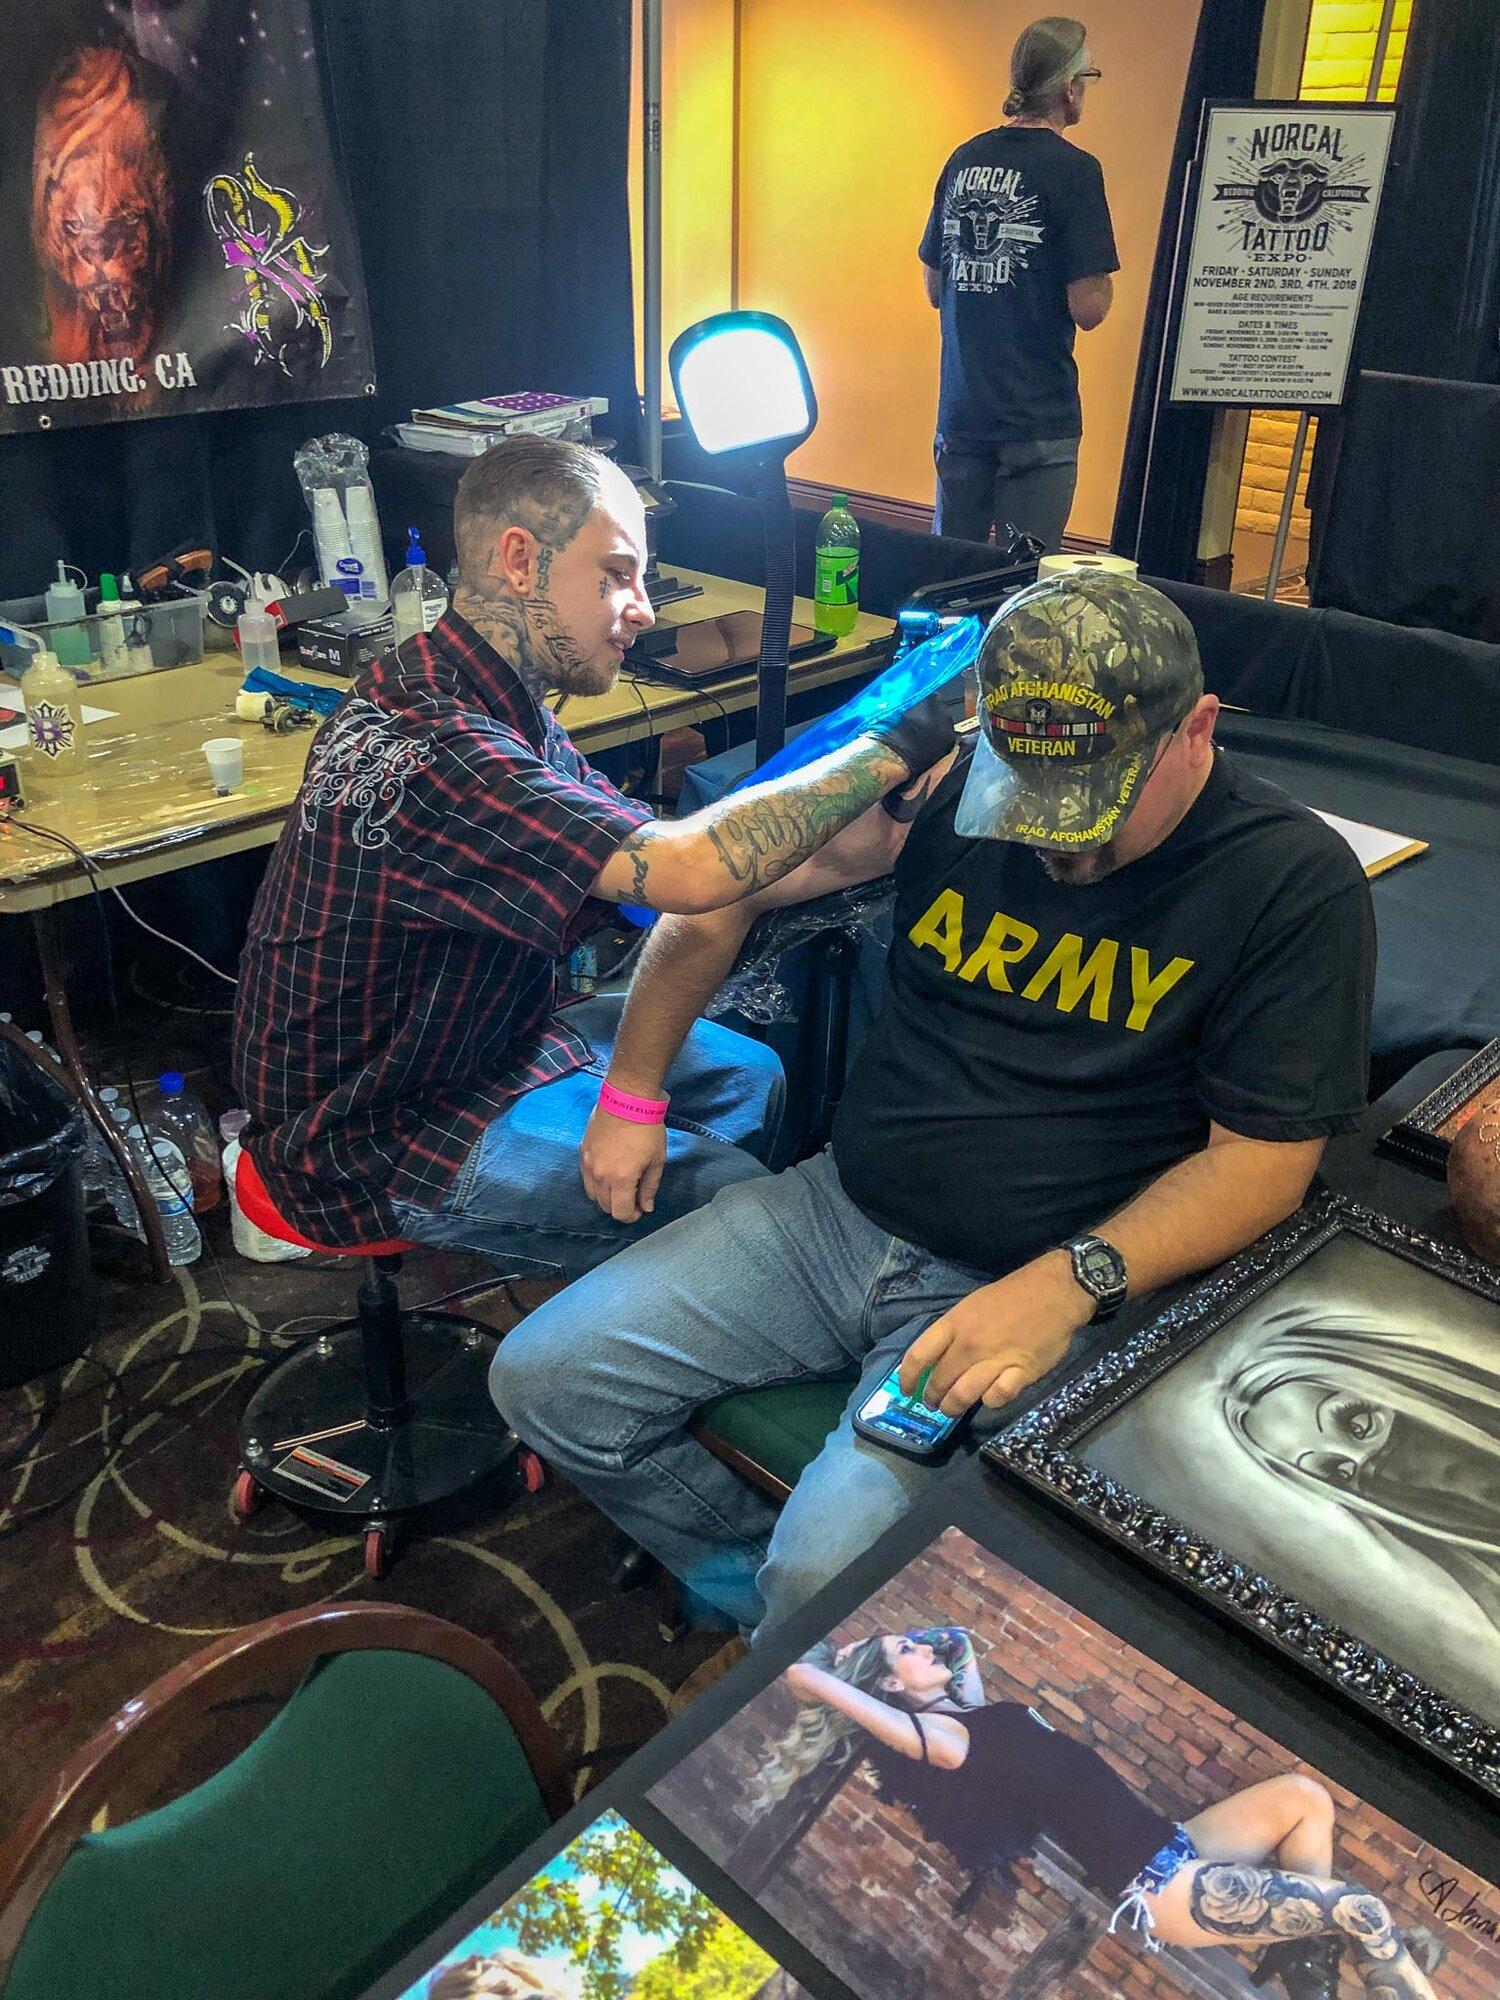 NorCal Tattoo Expo Redding CA-5.jpg